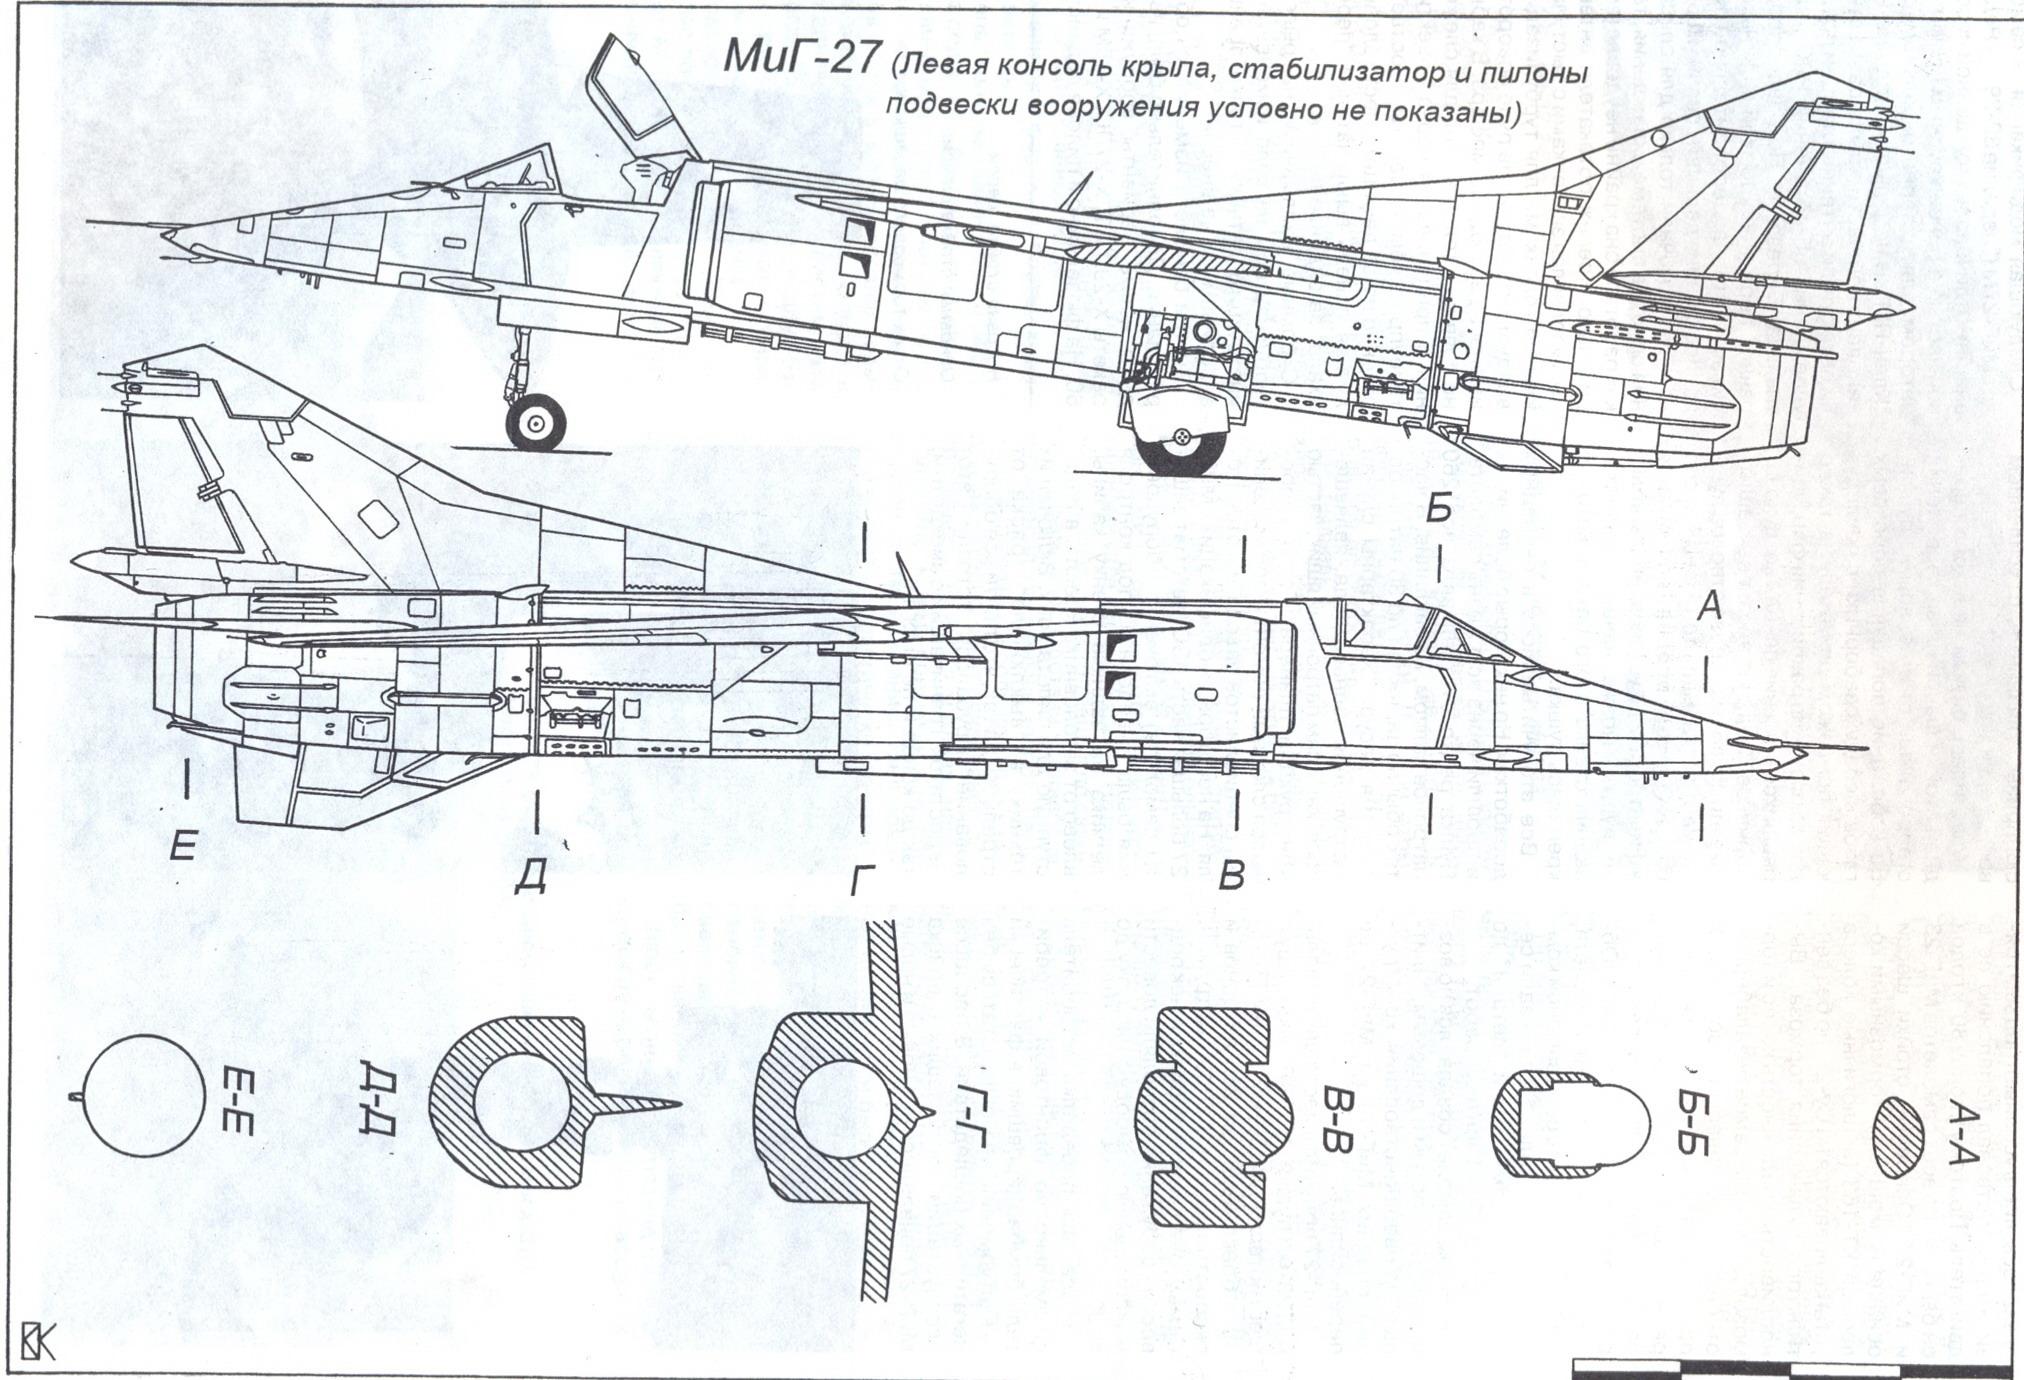 MiG-27 blueprint